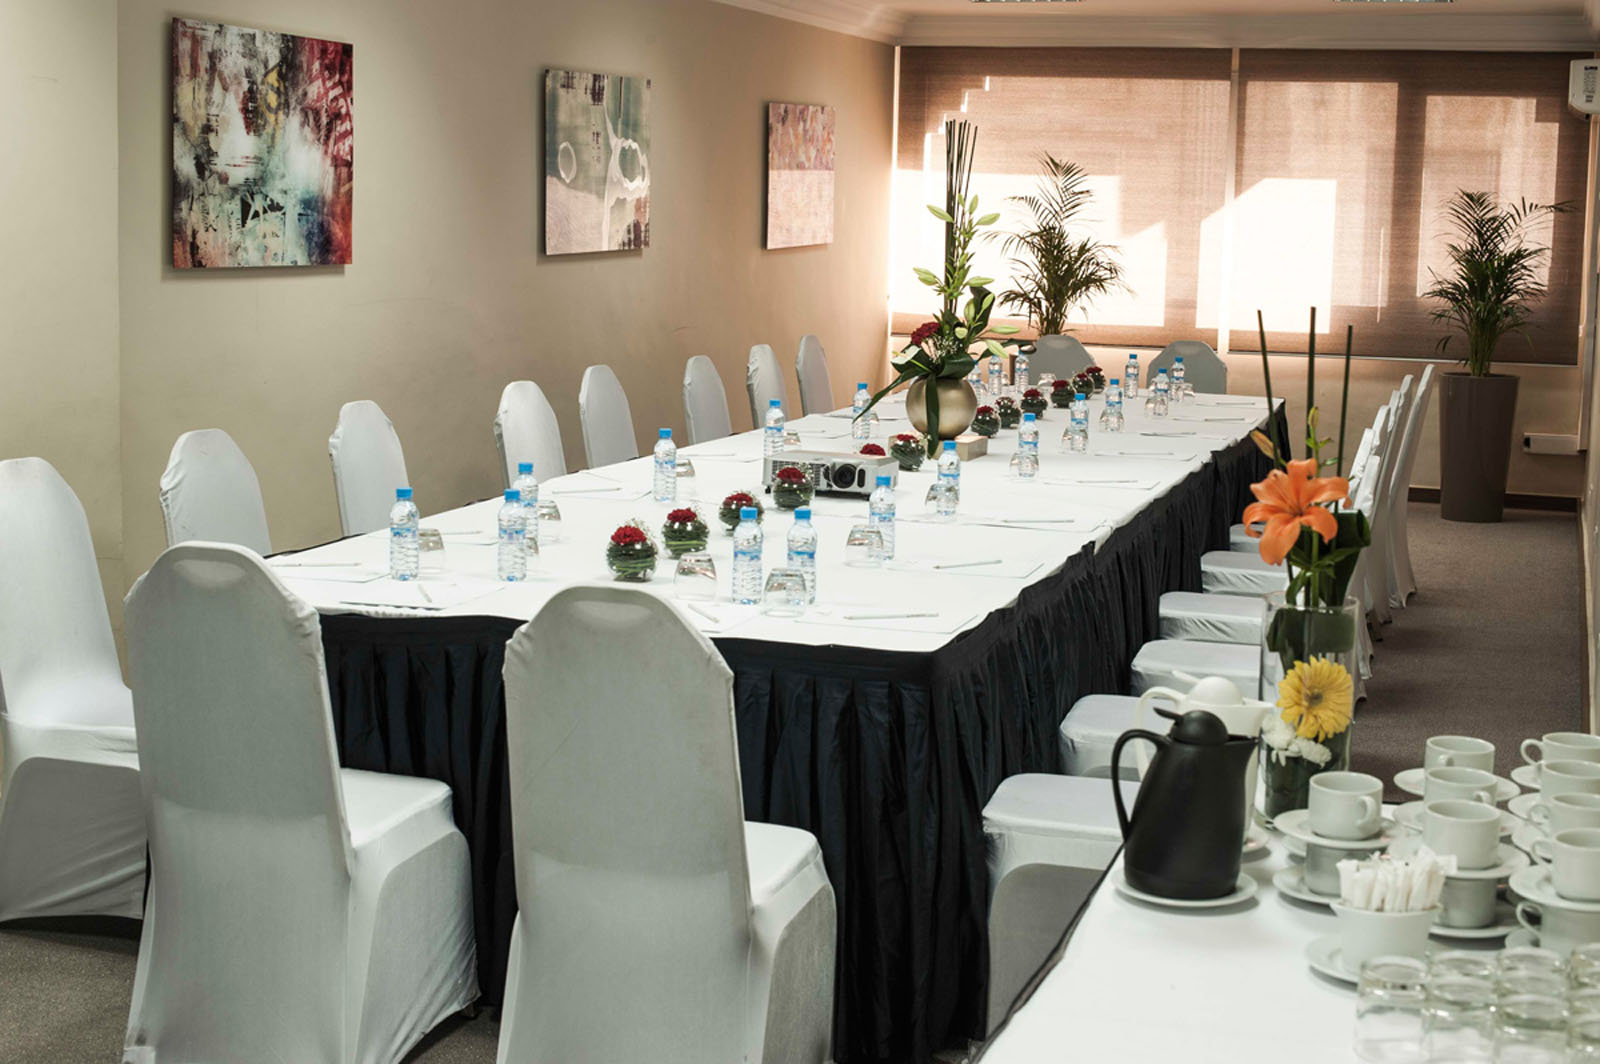 Meeting room at Kenzi Basma Hotel in Casablanca, Morocco